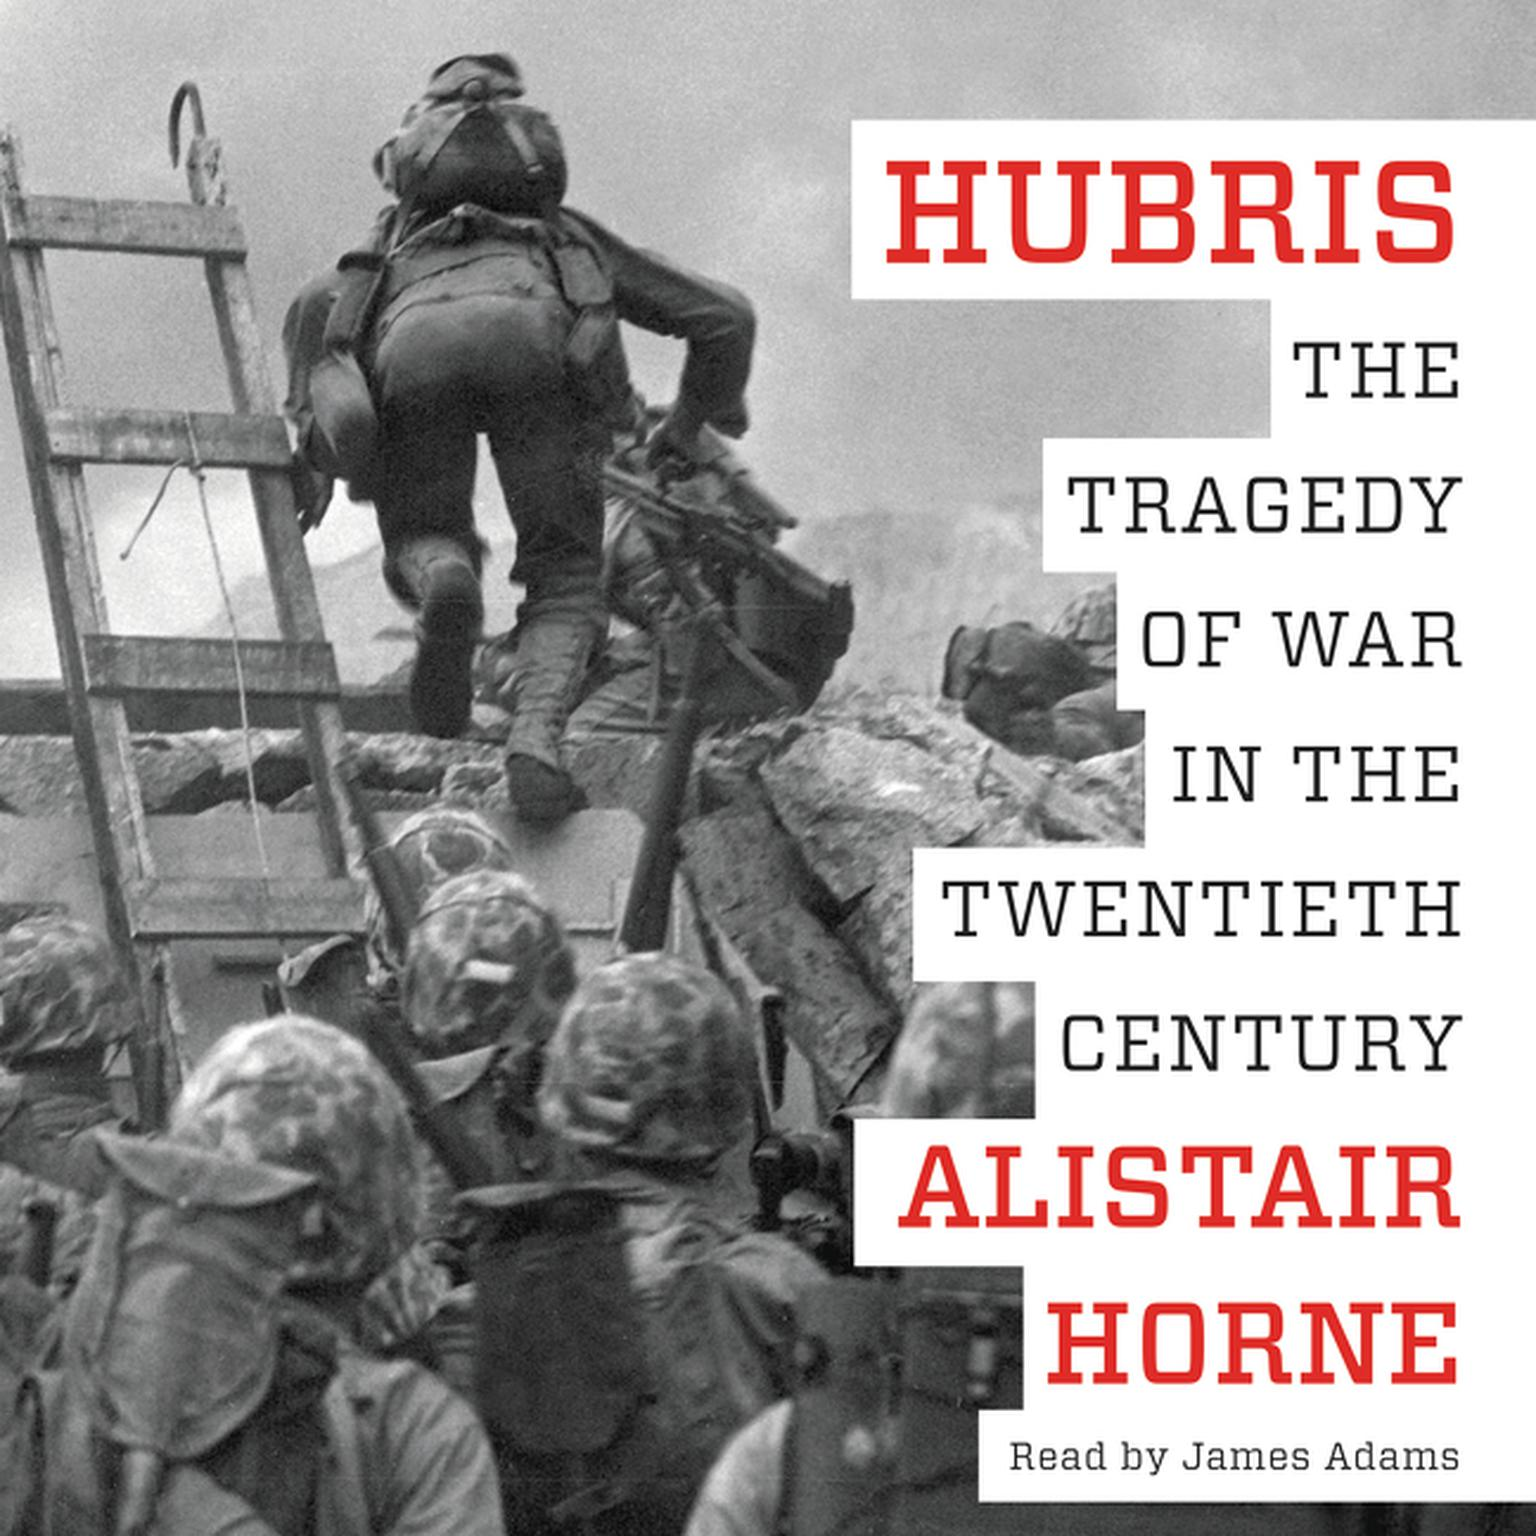 Hubris: The Tragedy of War in the Twentieth Century Audiobook, by Alistair Horne